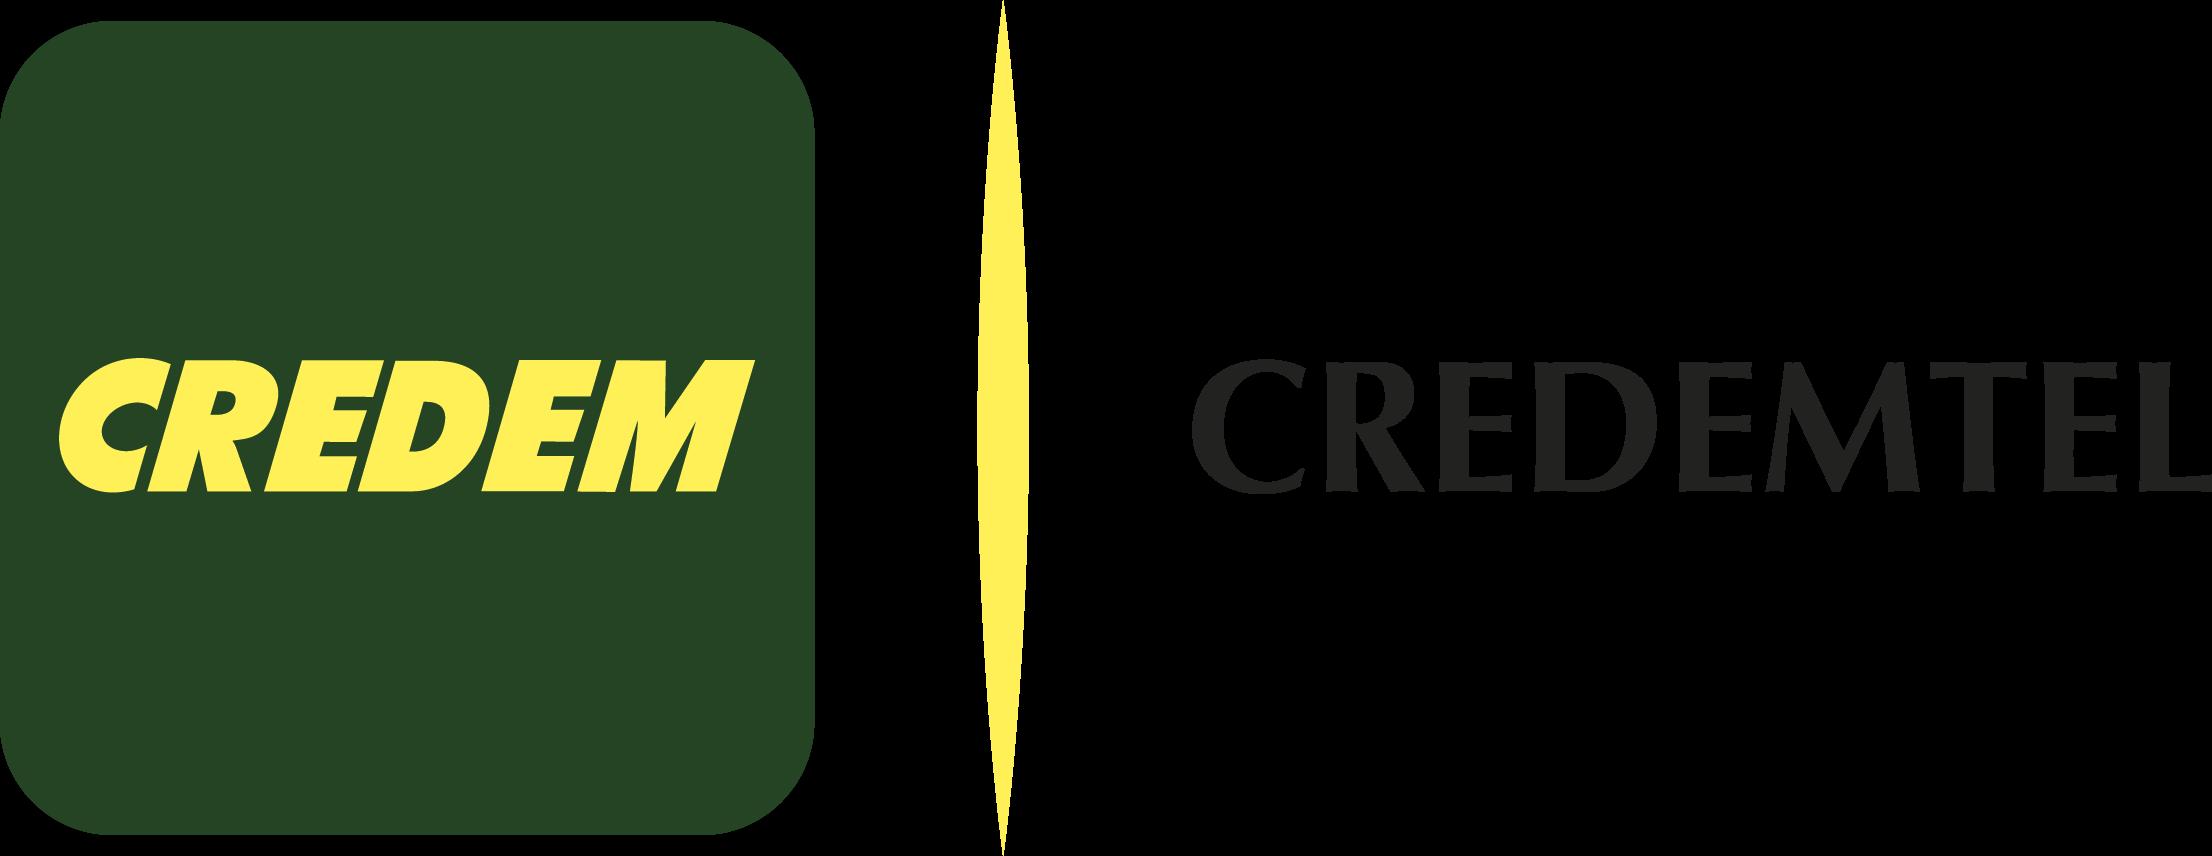 LogoCredemtel